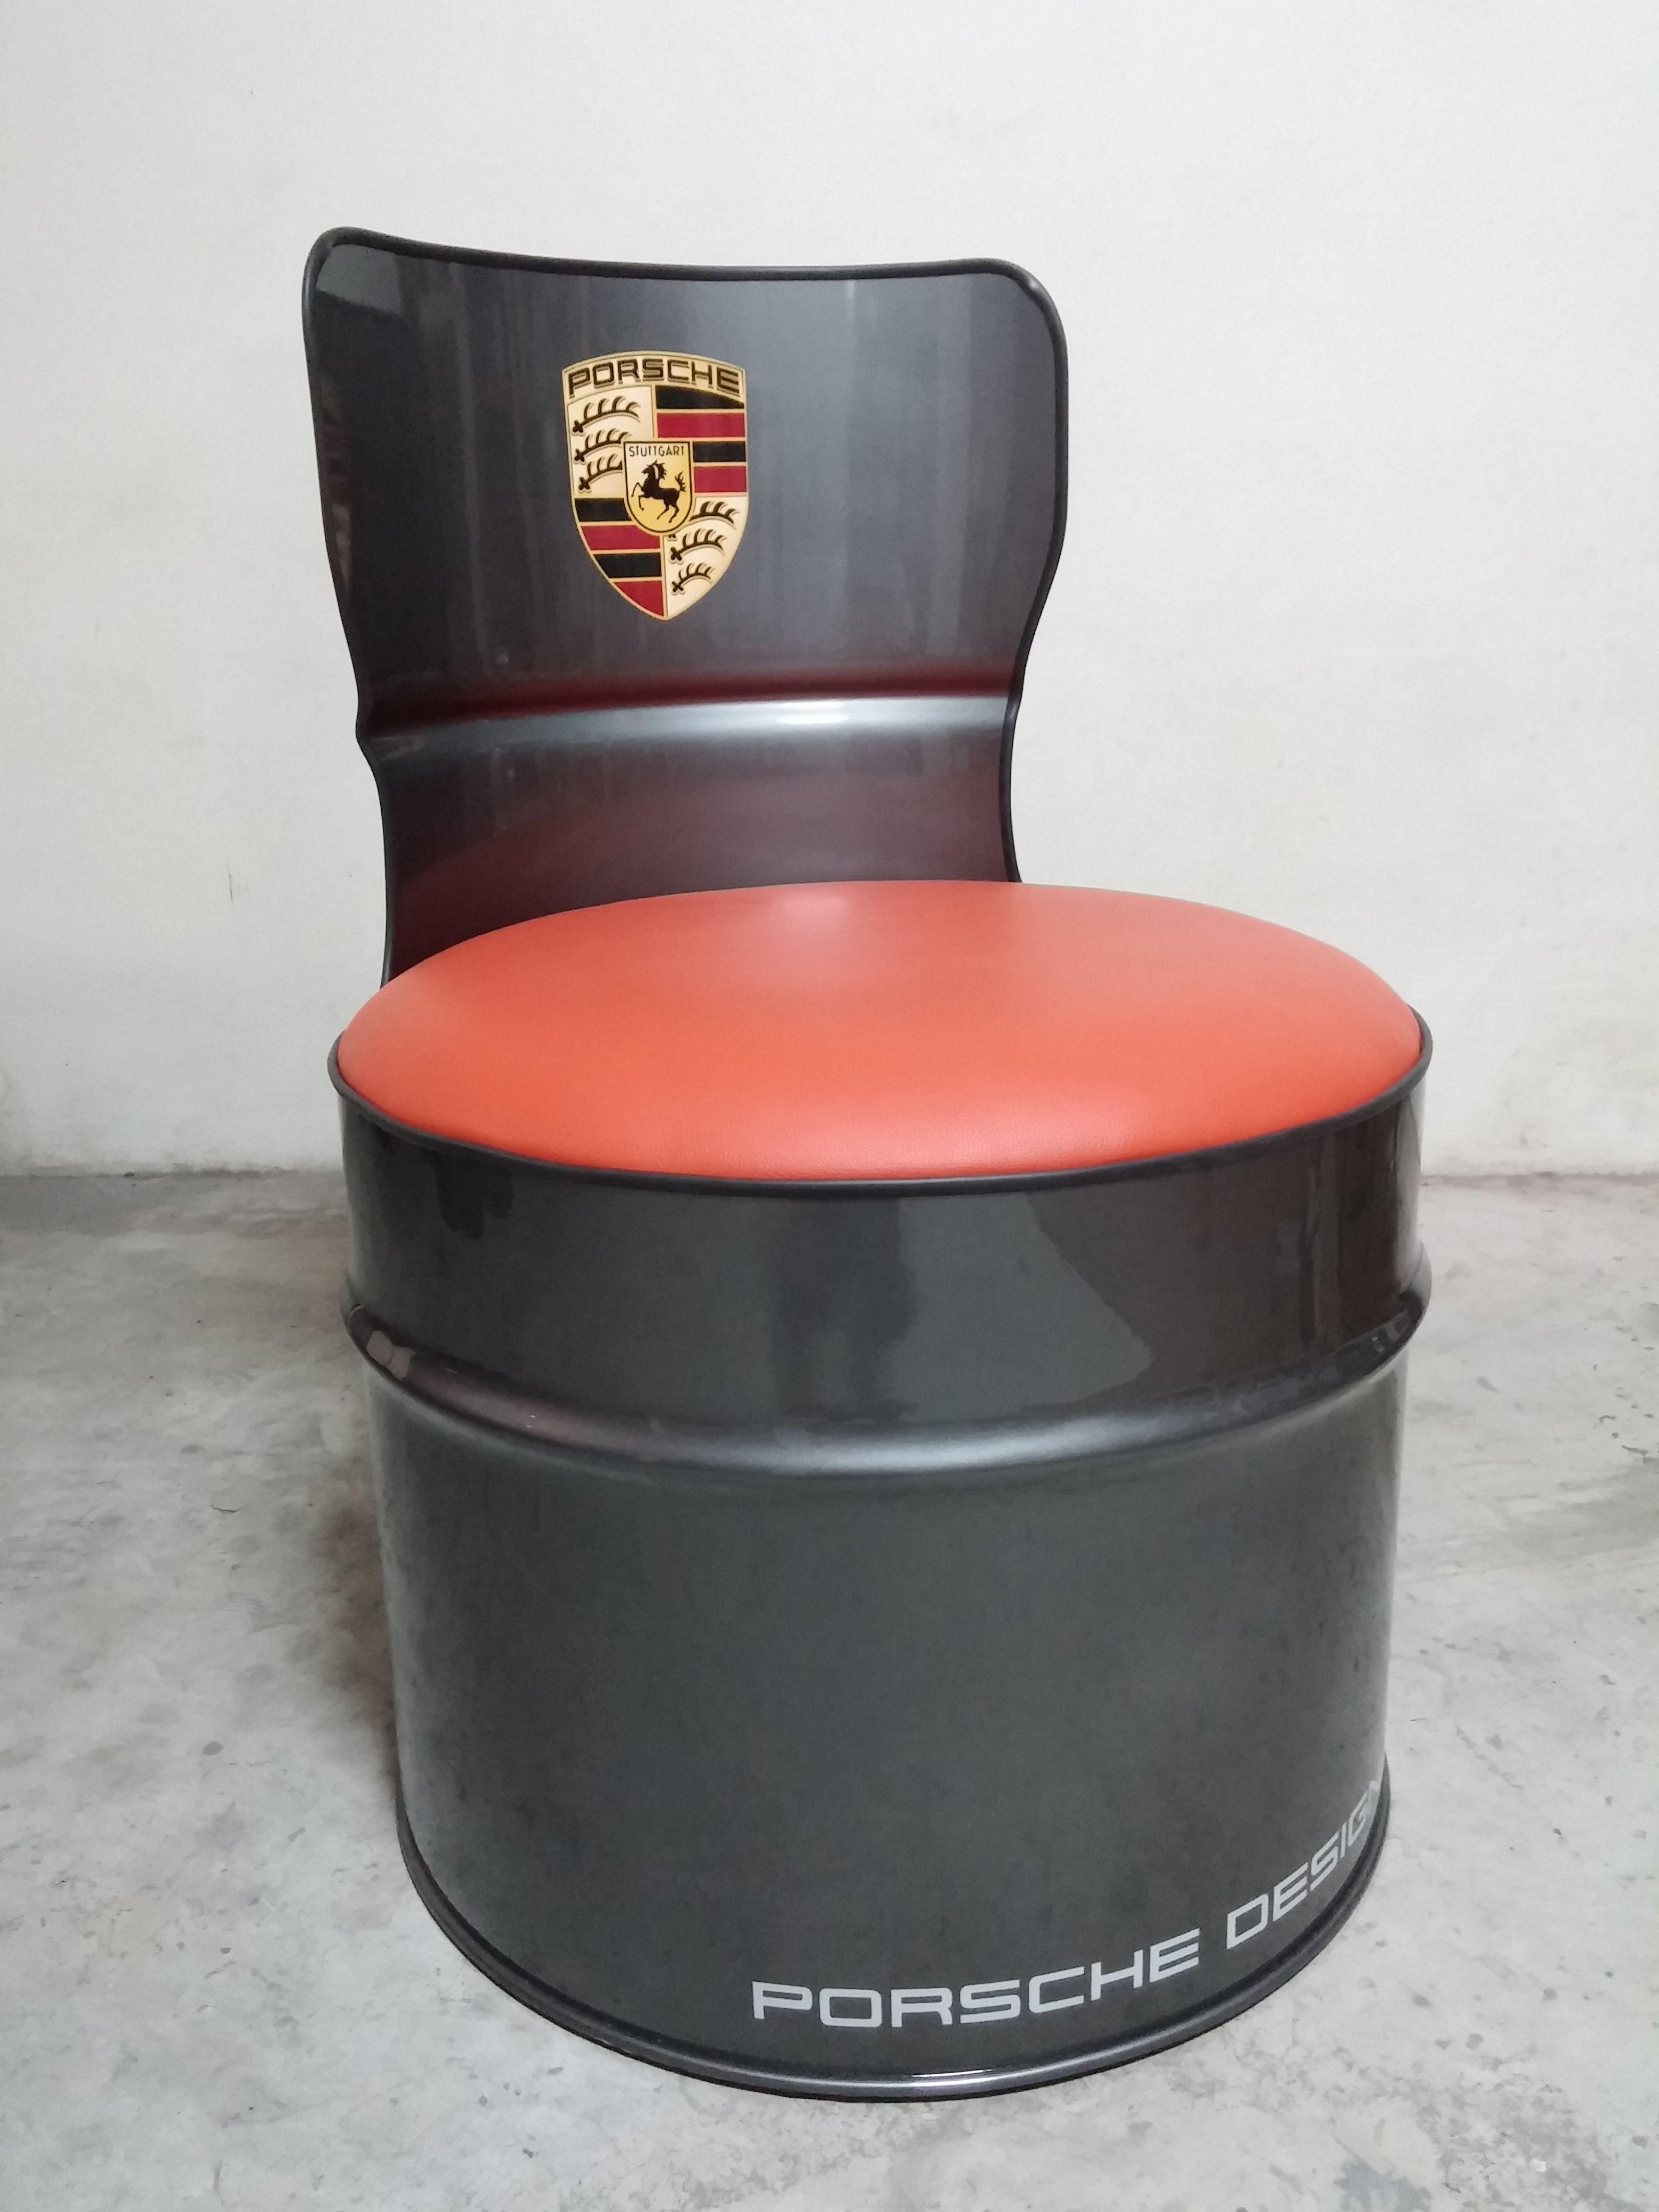 oil drum seat porsche design | tonel decoração, decoracao de